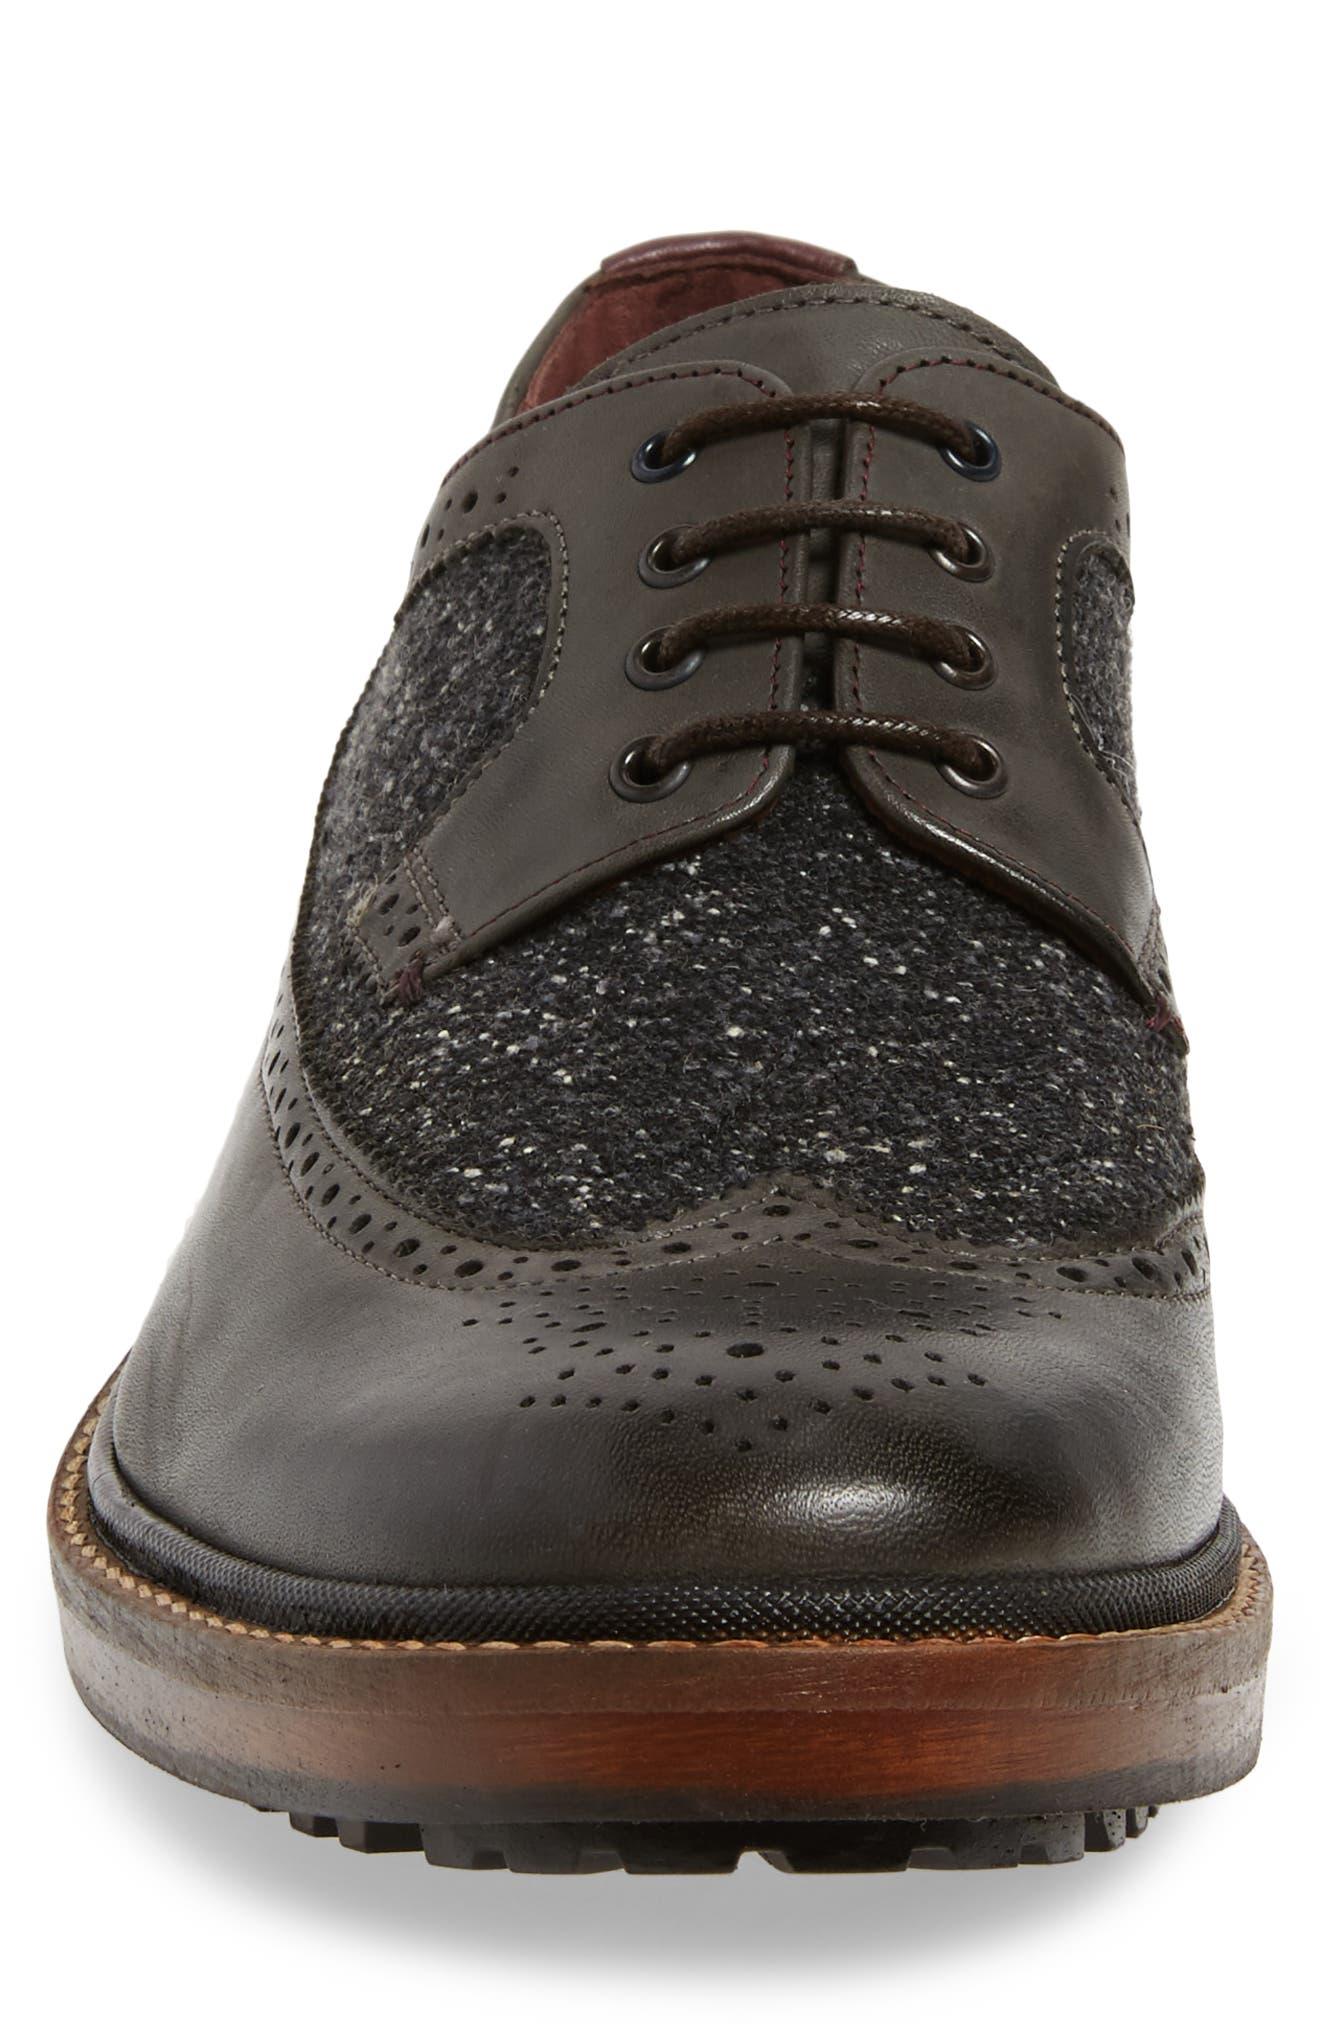 Casbo Spectator Shoe,                             Alternate thumbnail 4, color,                             080